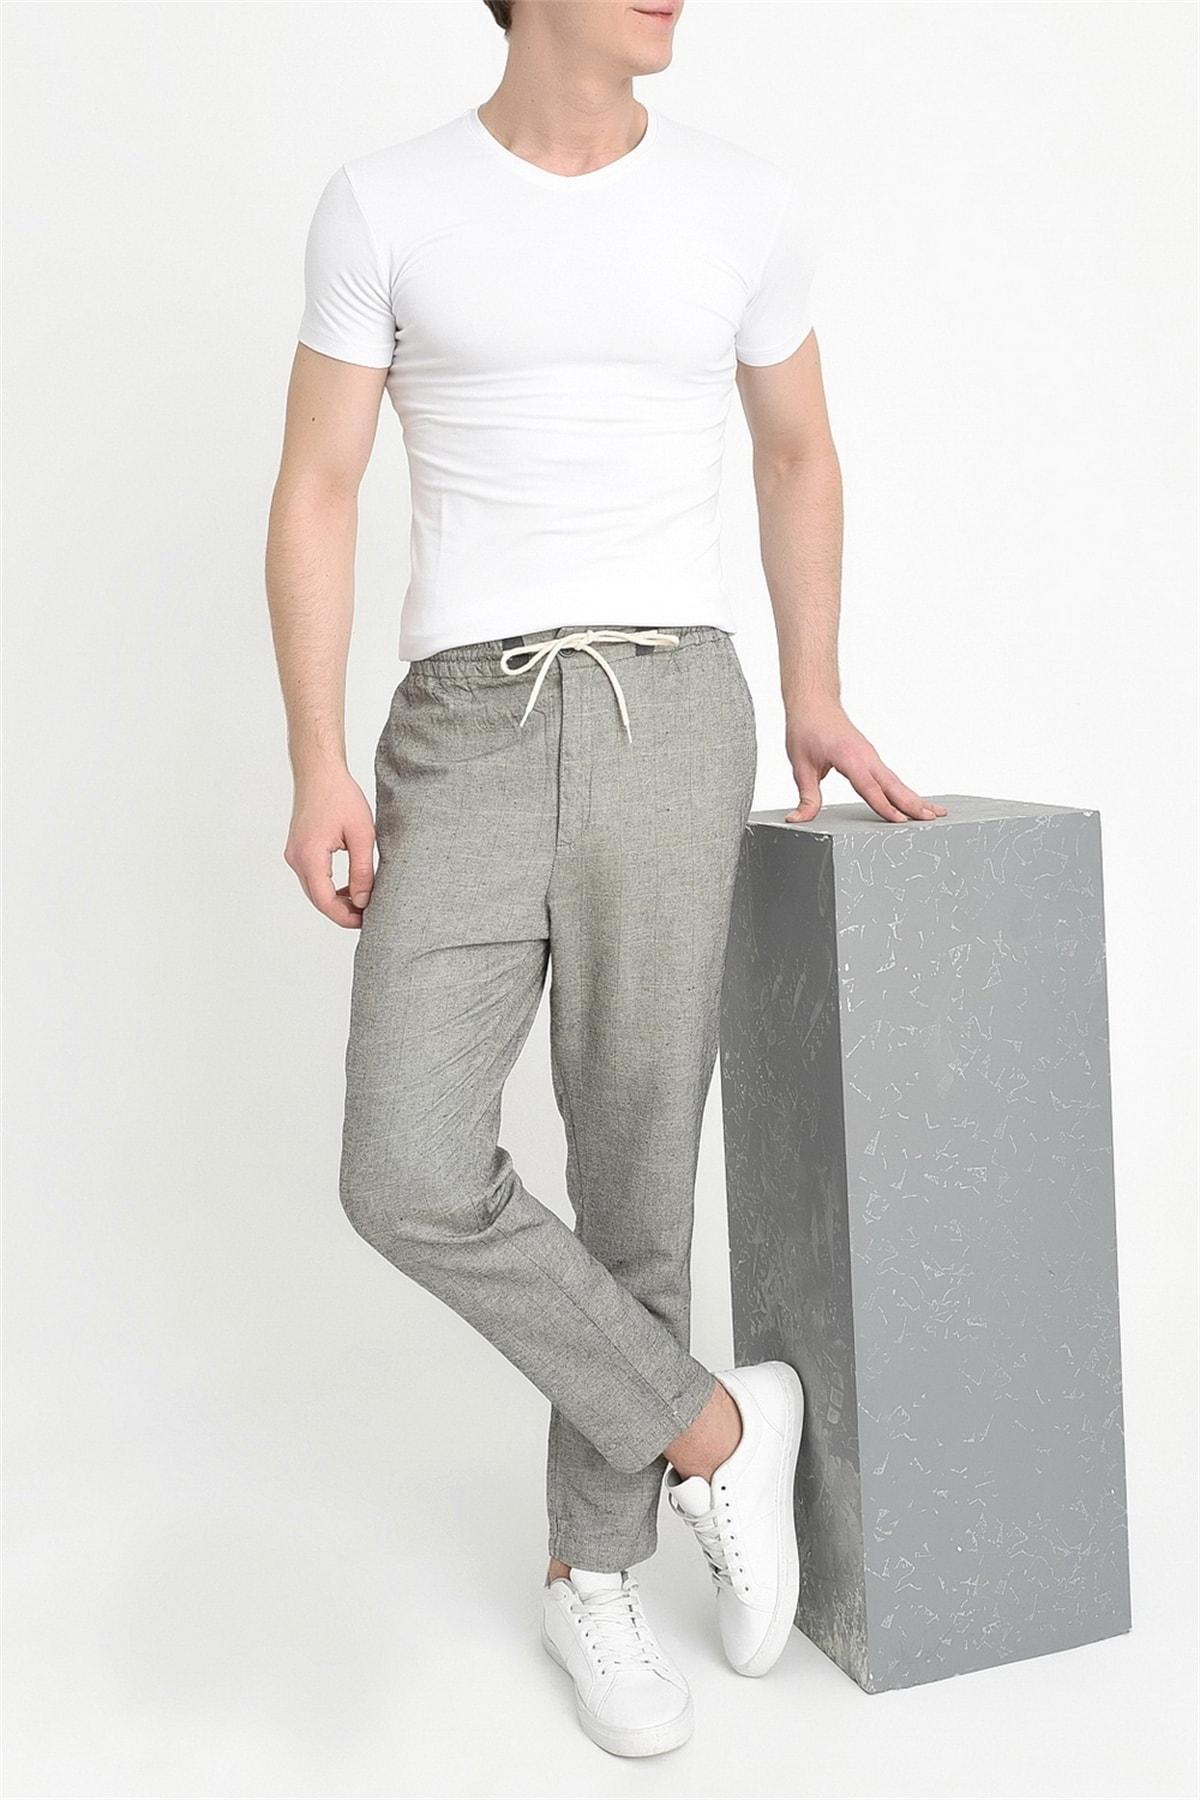 Efor Atp 09 Slim Fit Gri Spor Pantolon 2